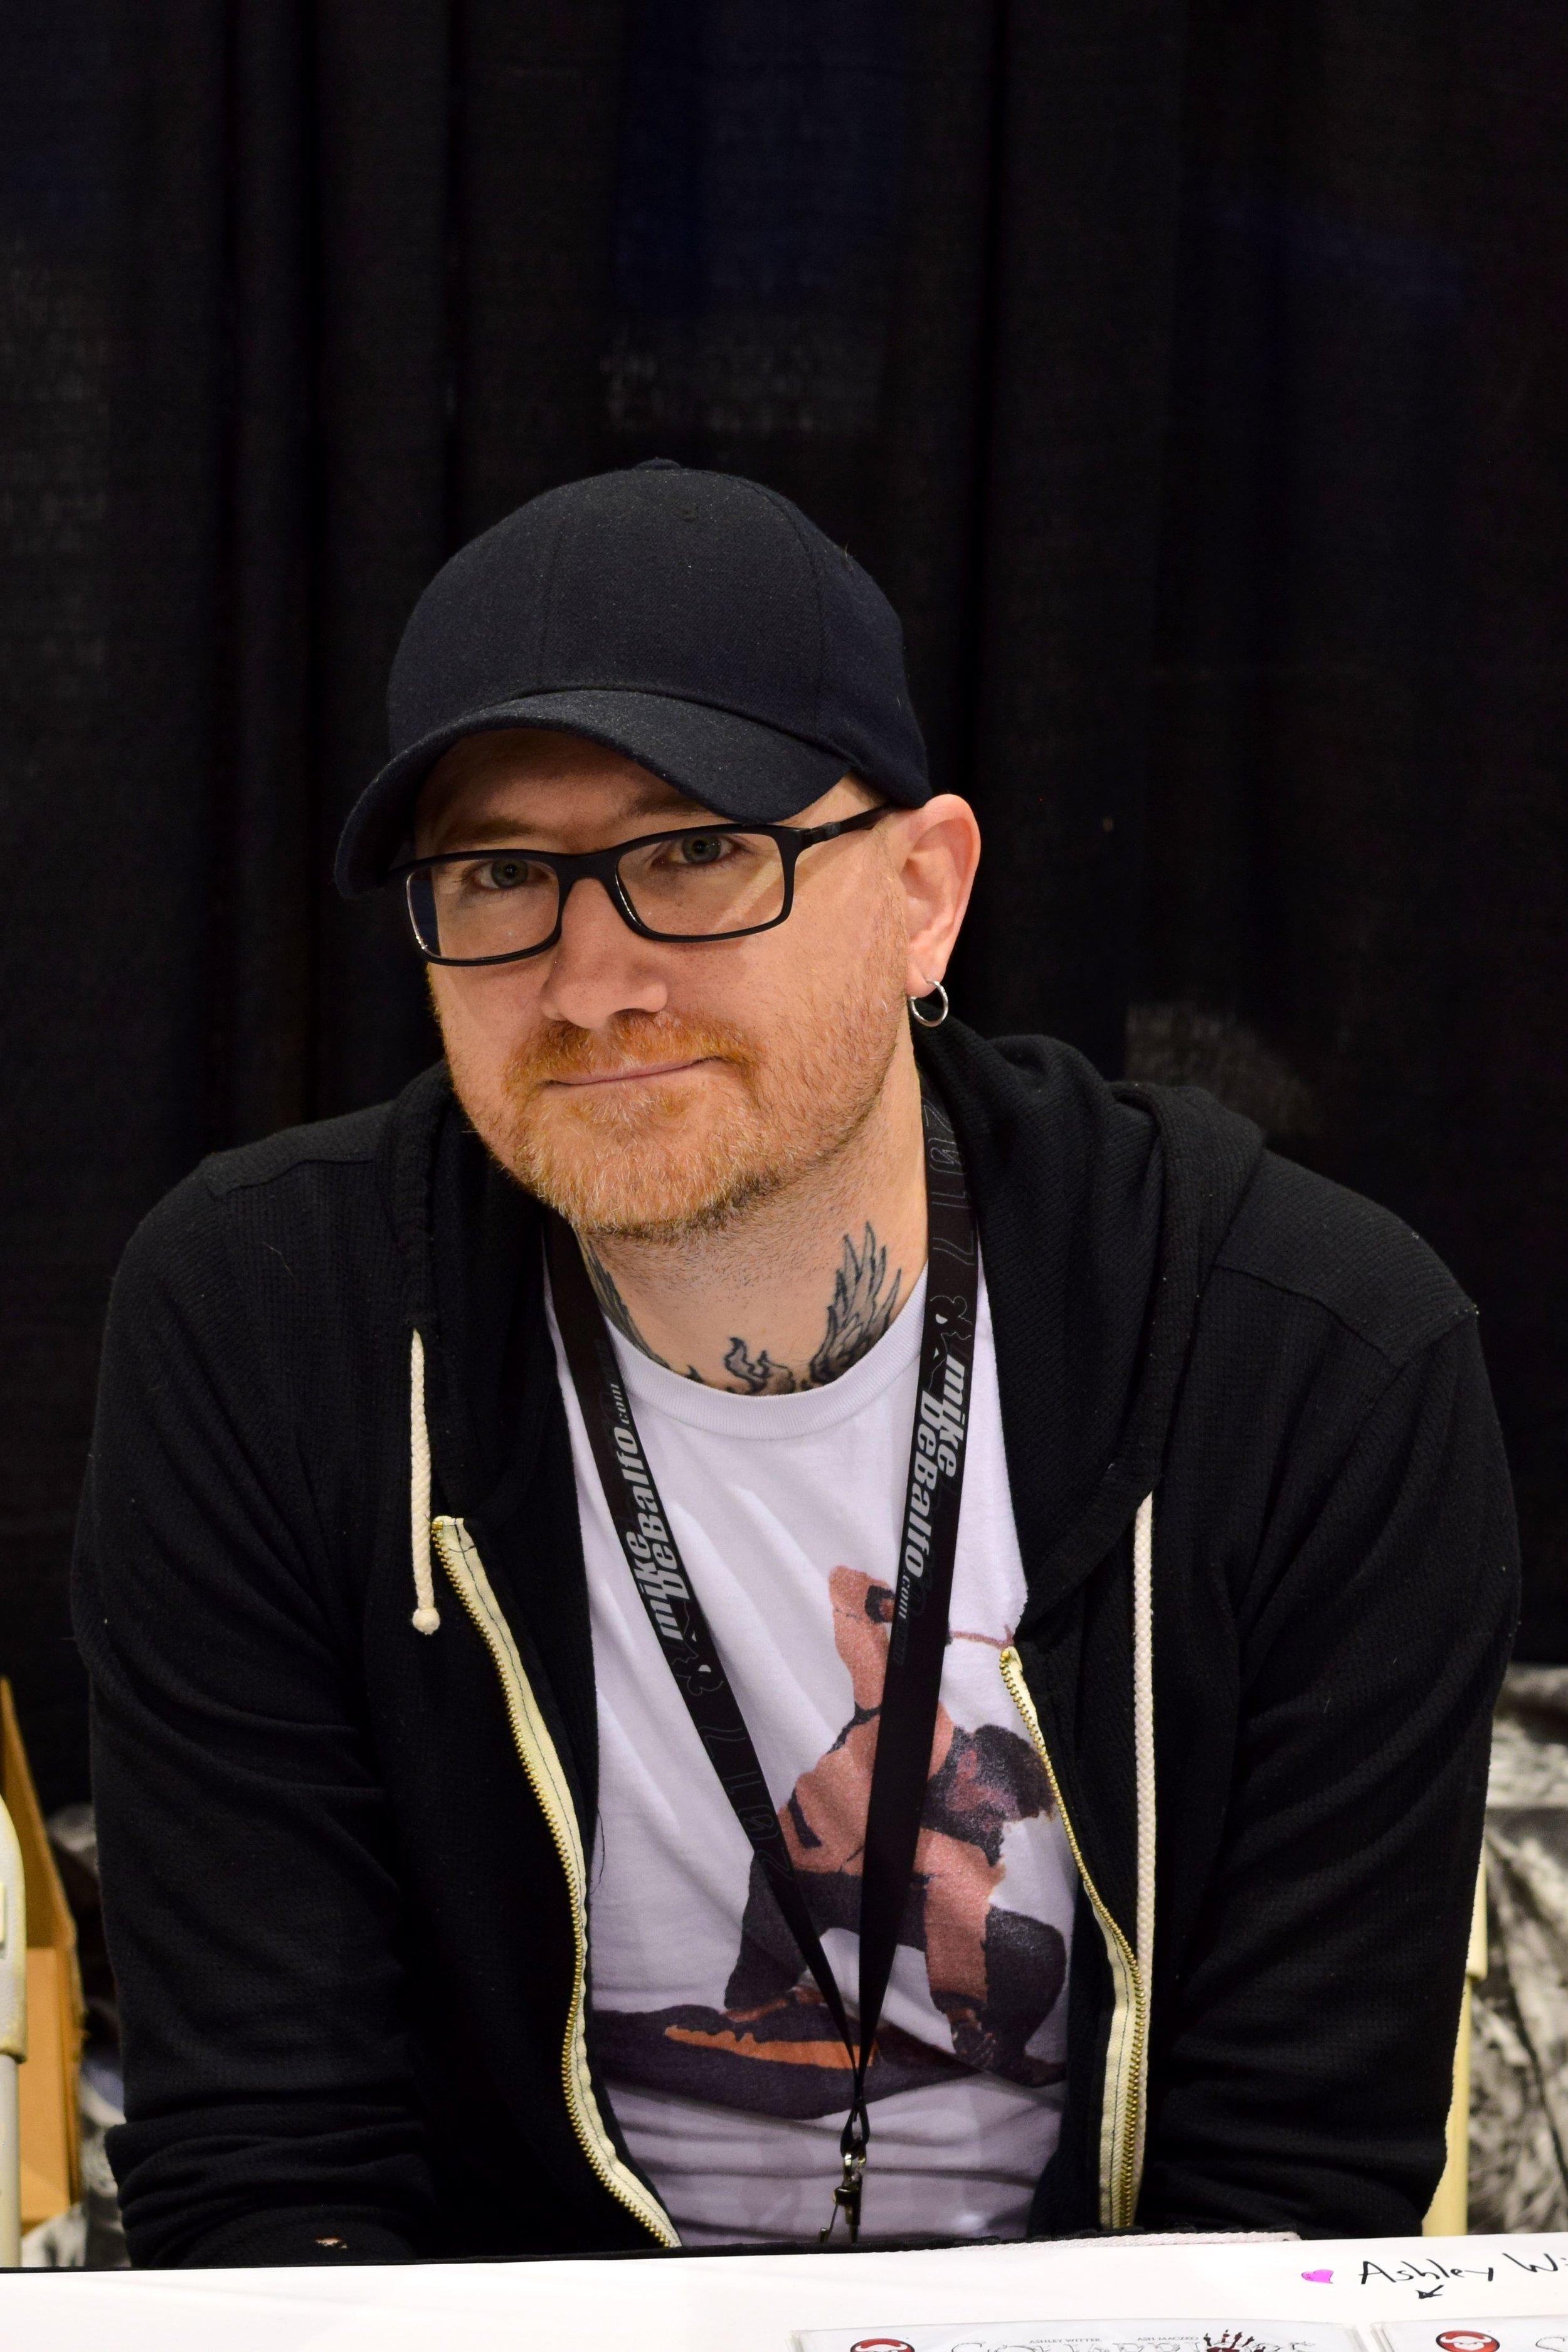 Ash Maczko at Phoenix Comic Con 2017.